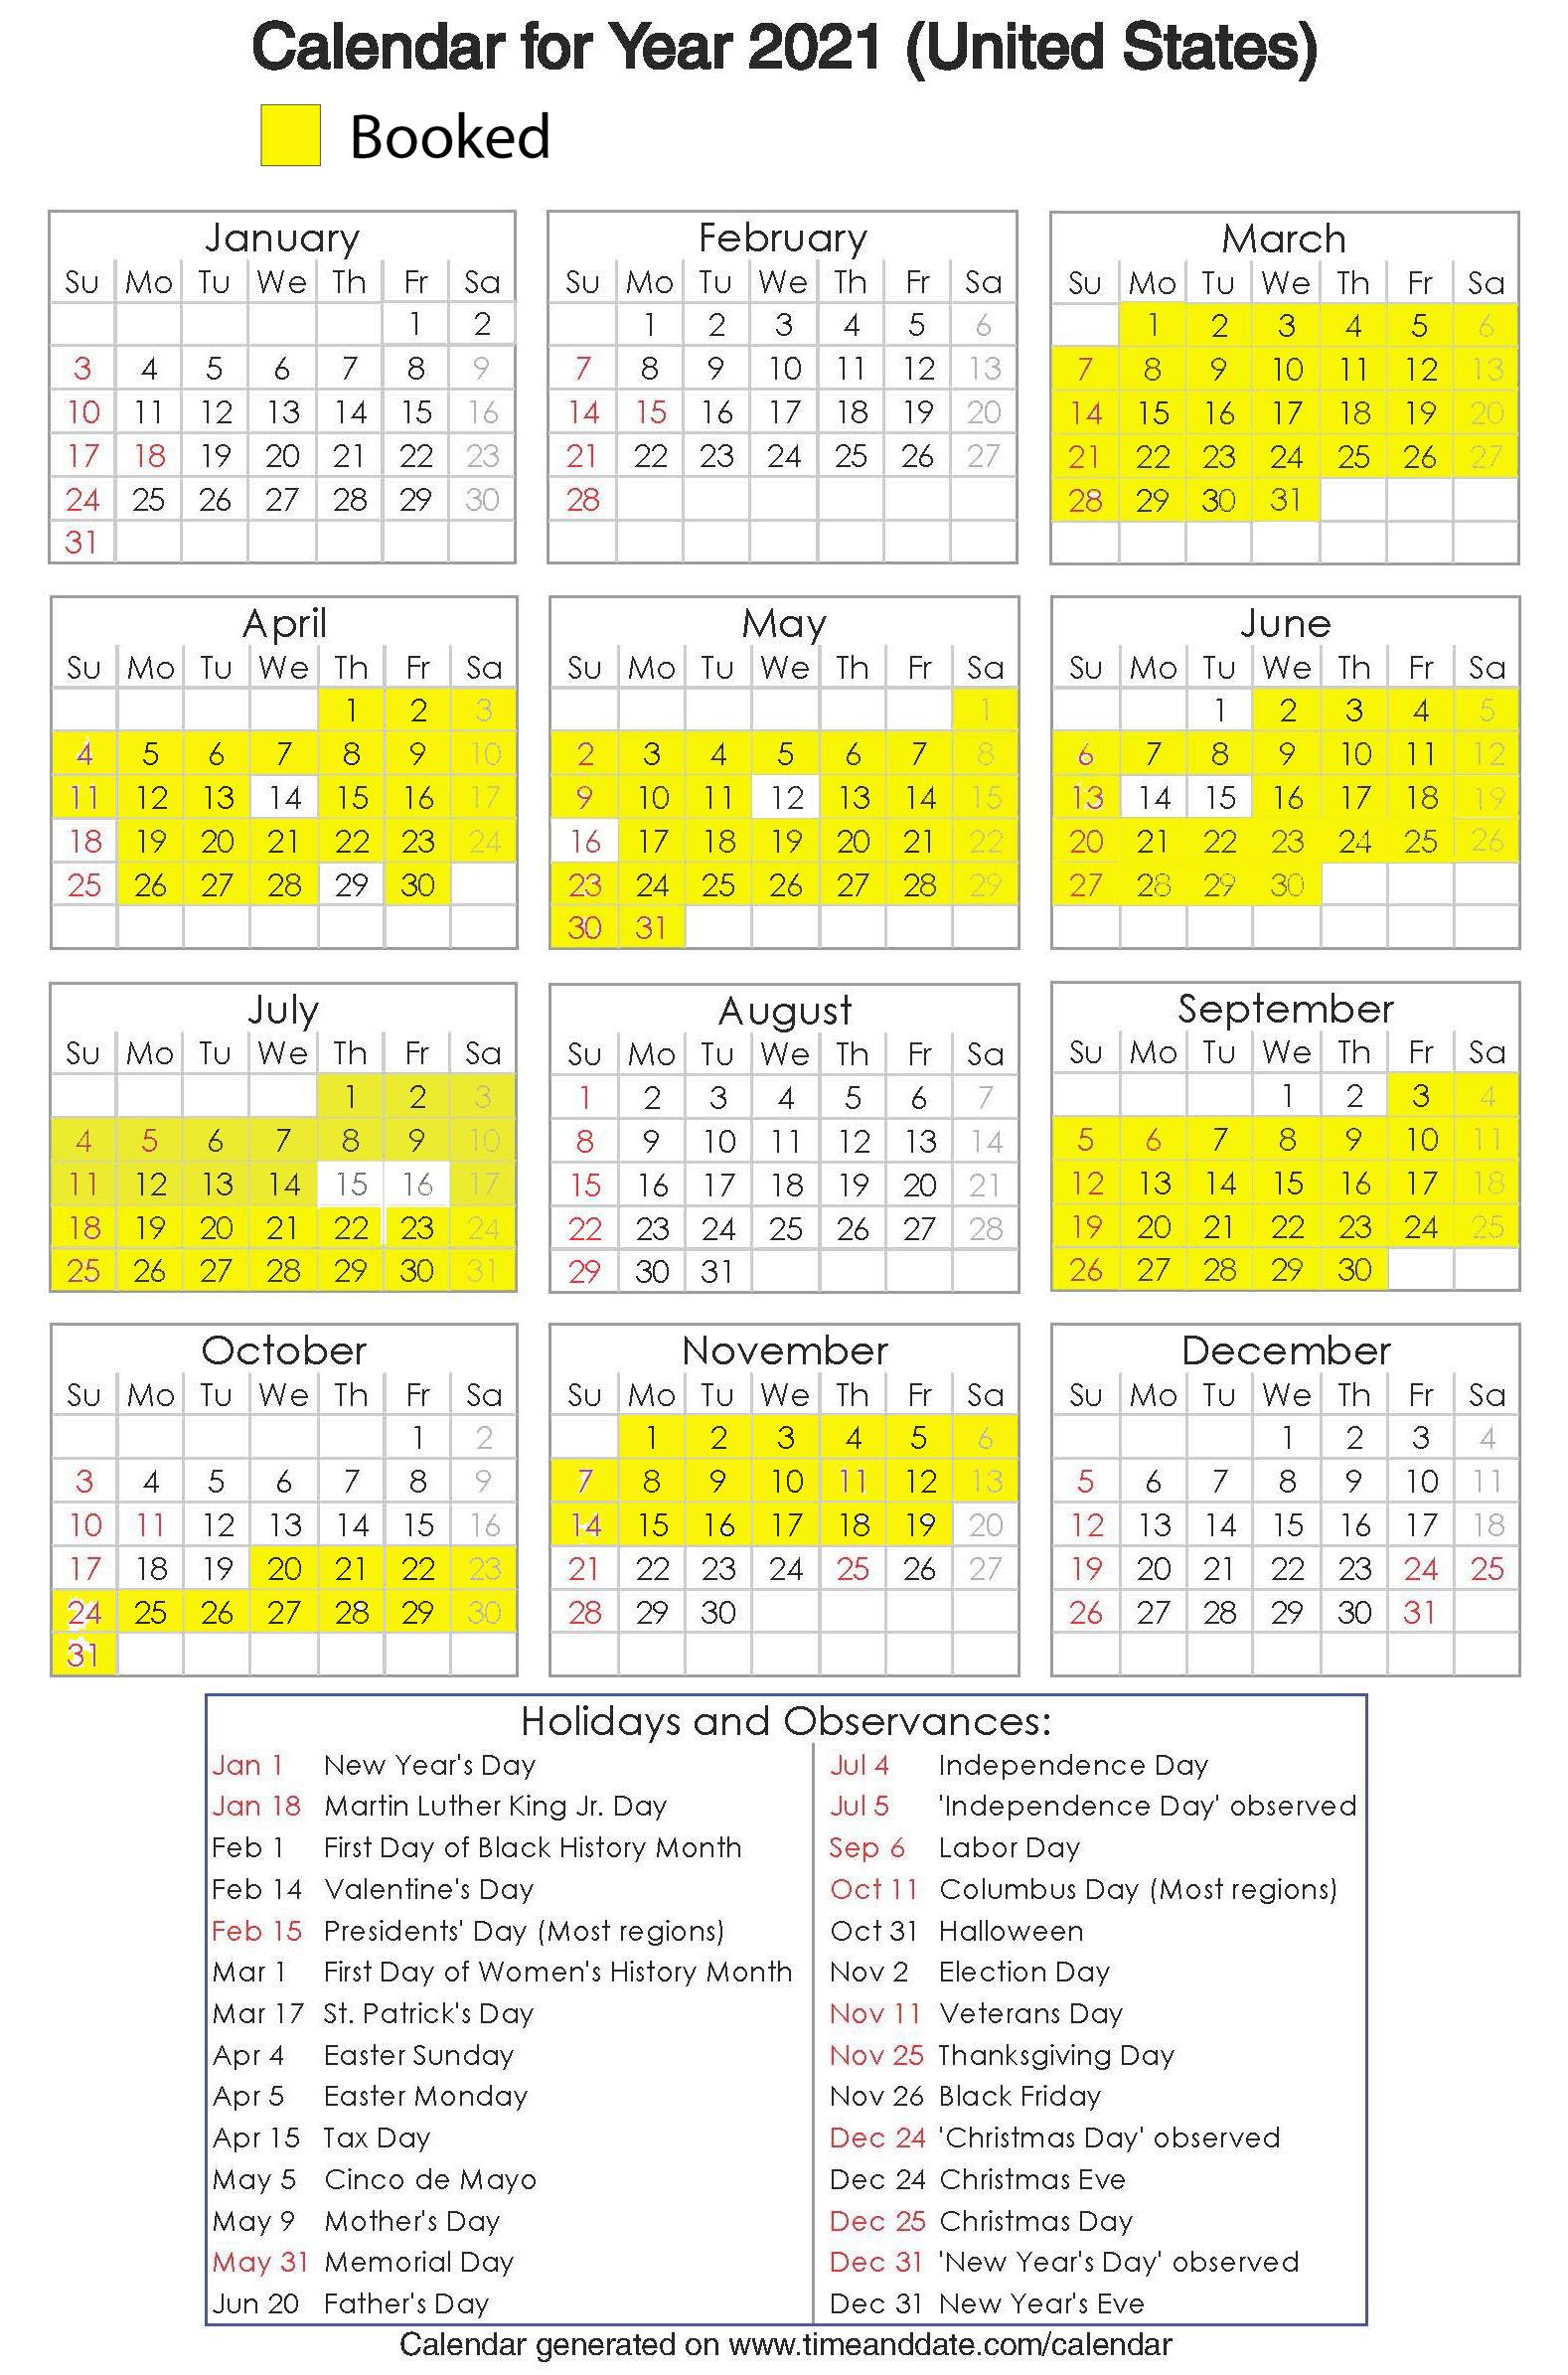 Year 2021 Calendar – United States 18